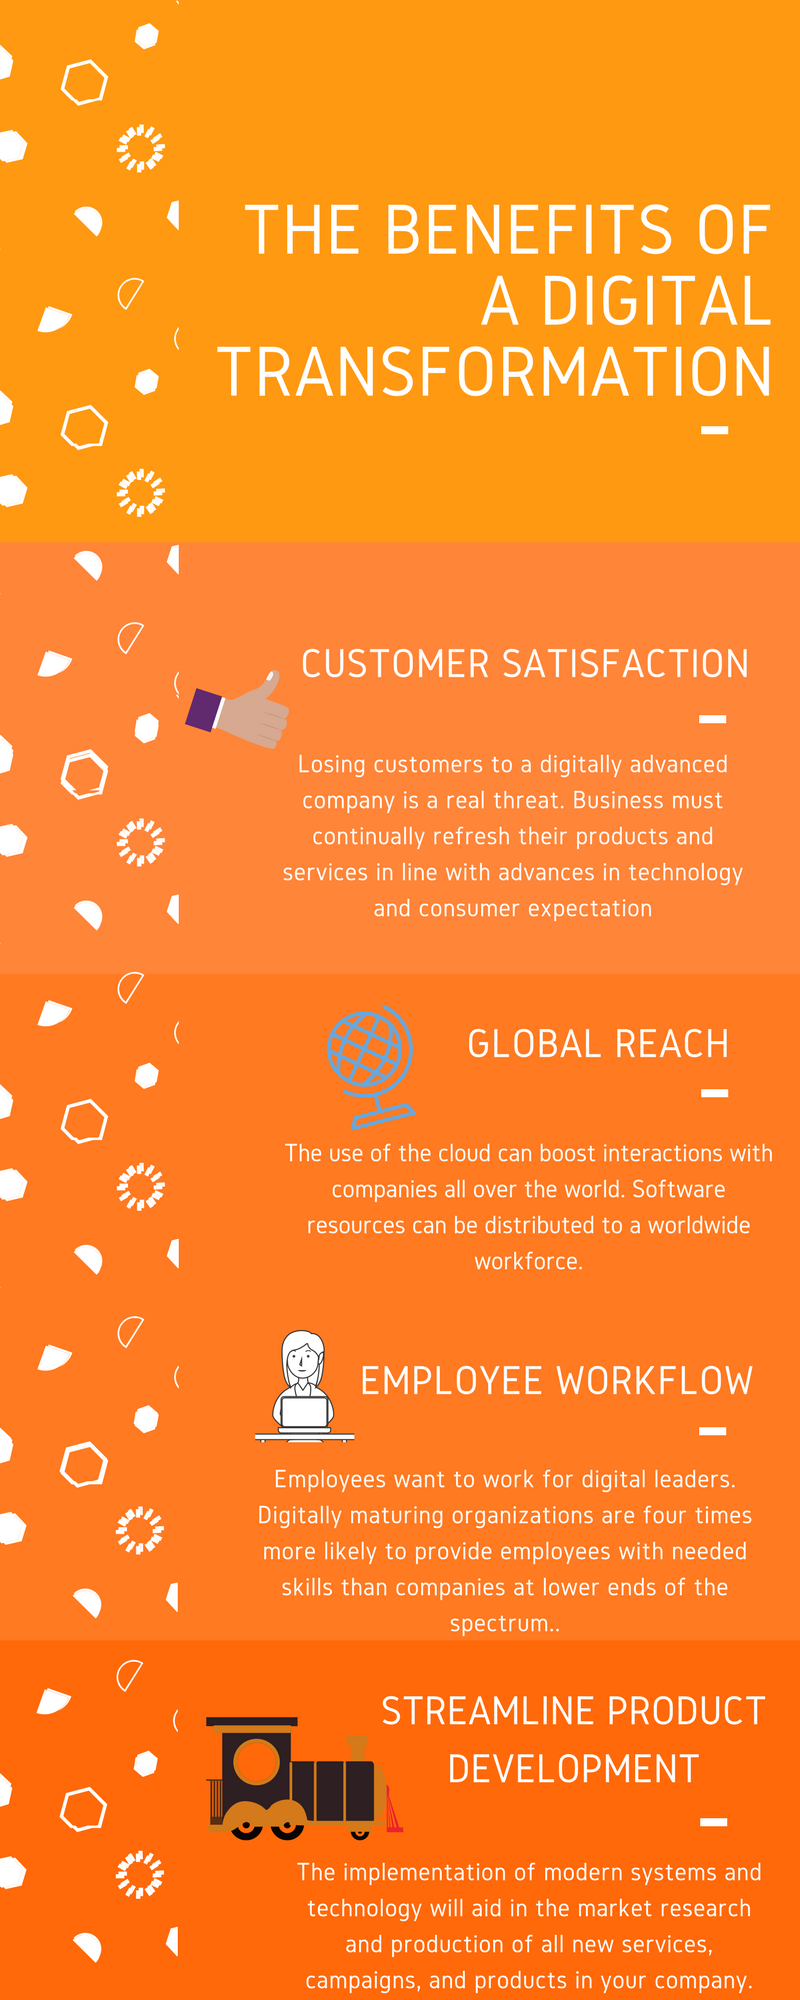 Benefits of a Digital Transformation